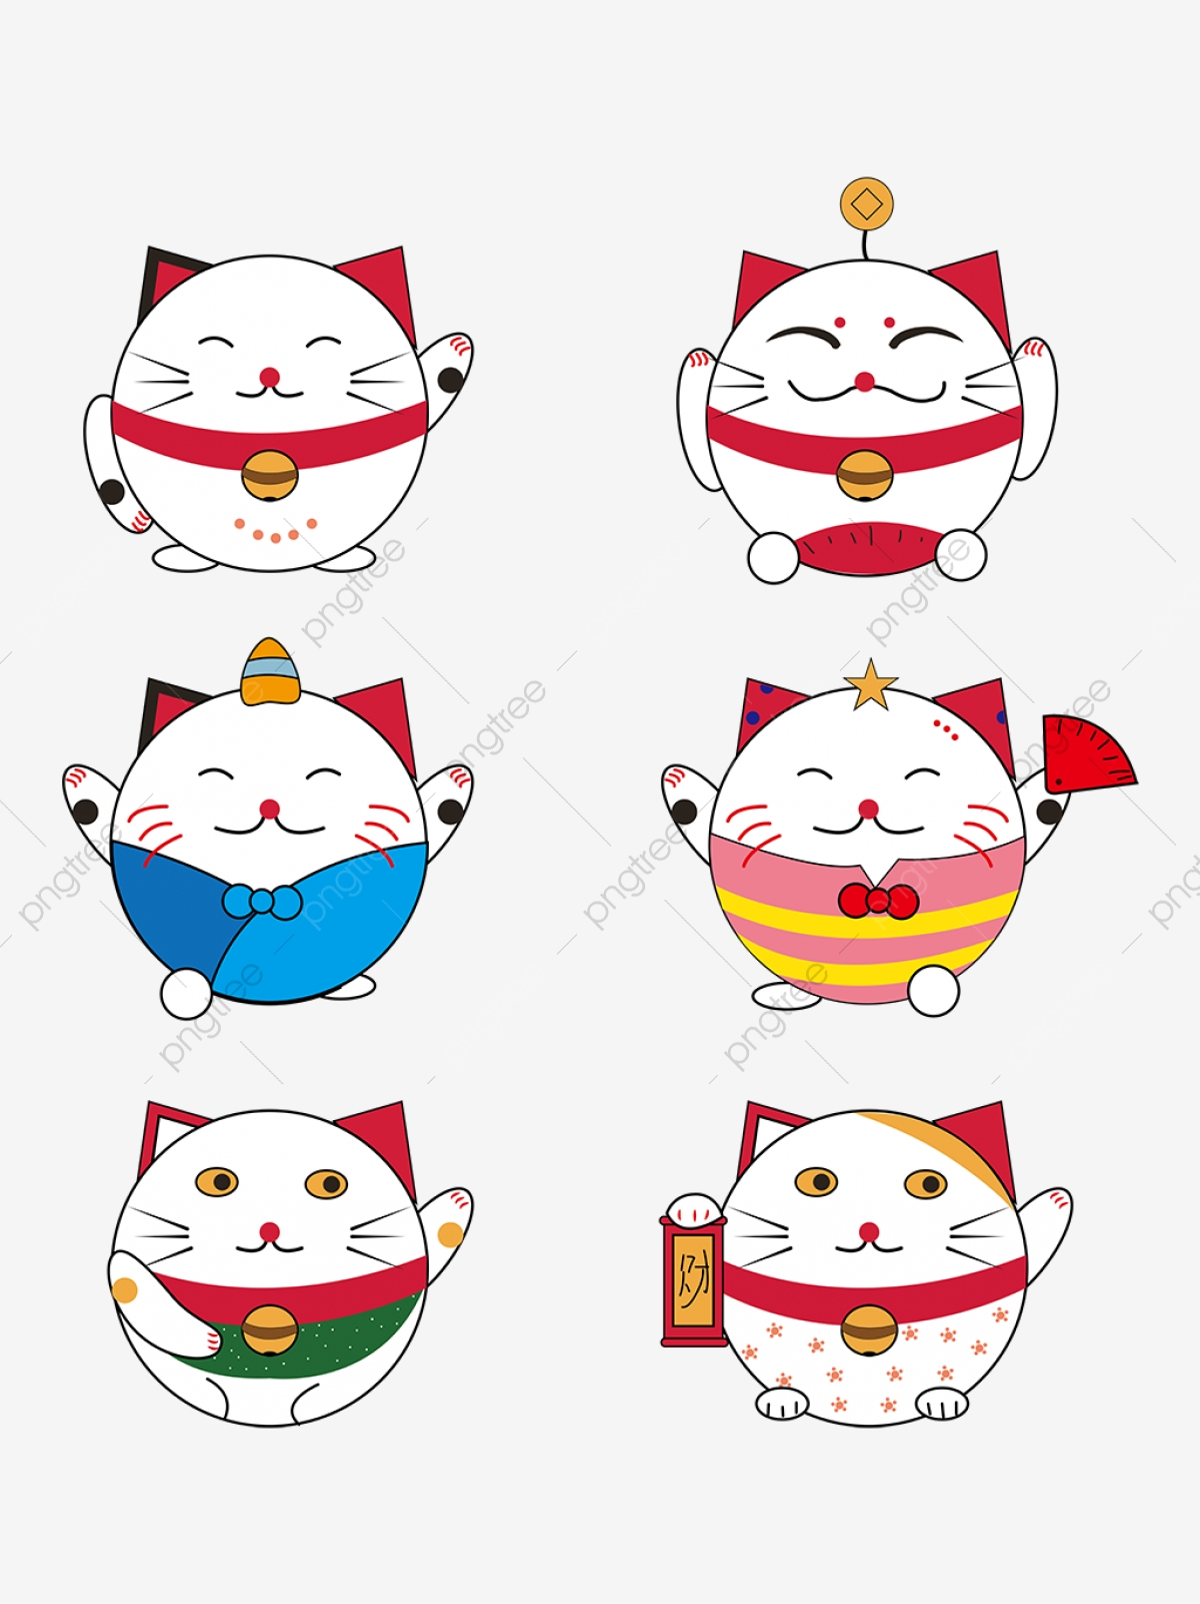 Kartun Kucing Lucu Bertuah Elemen Kucing Bertuah Kitten